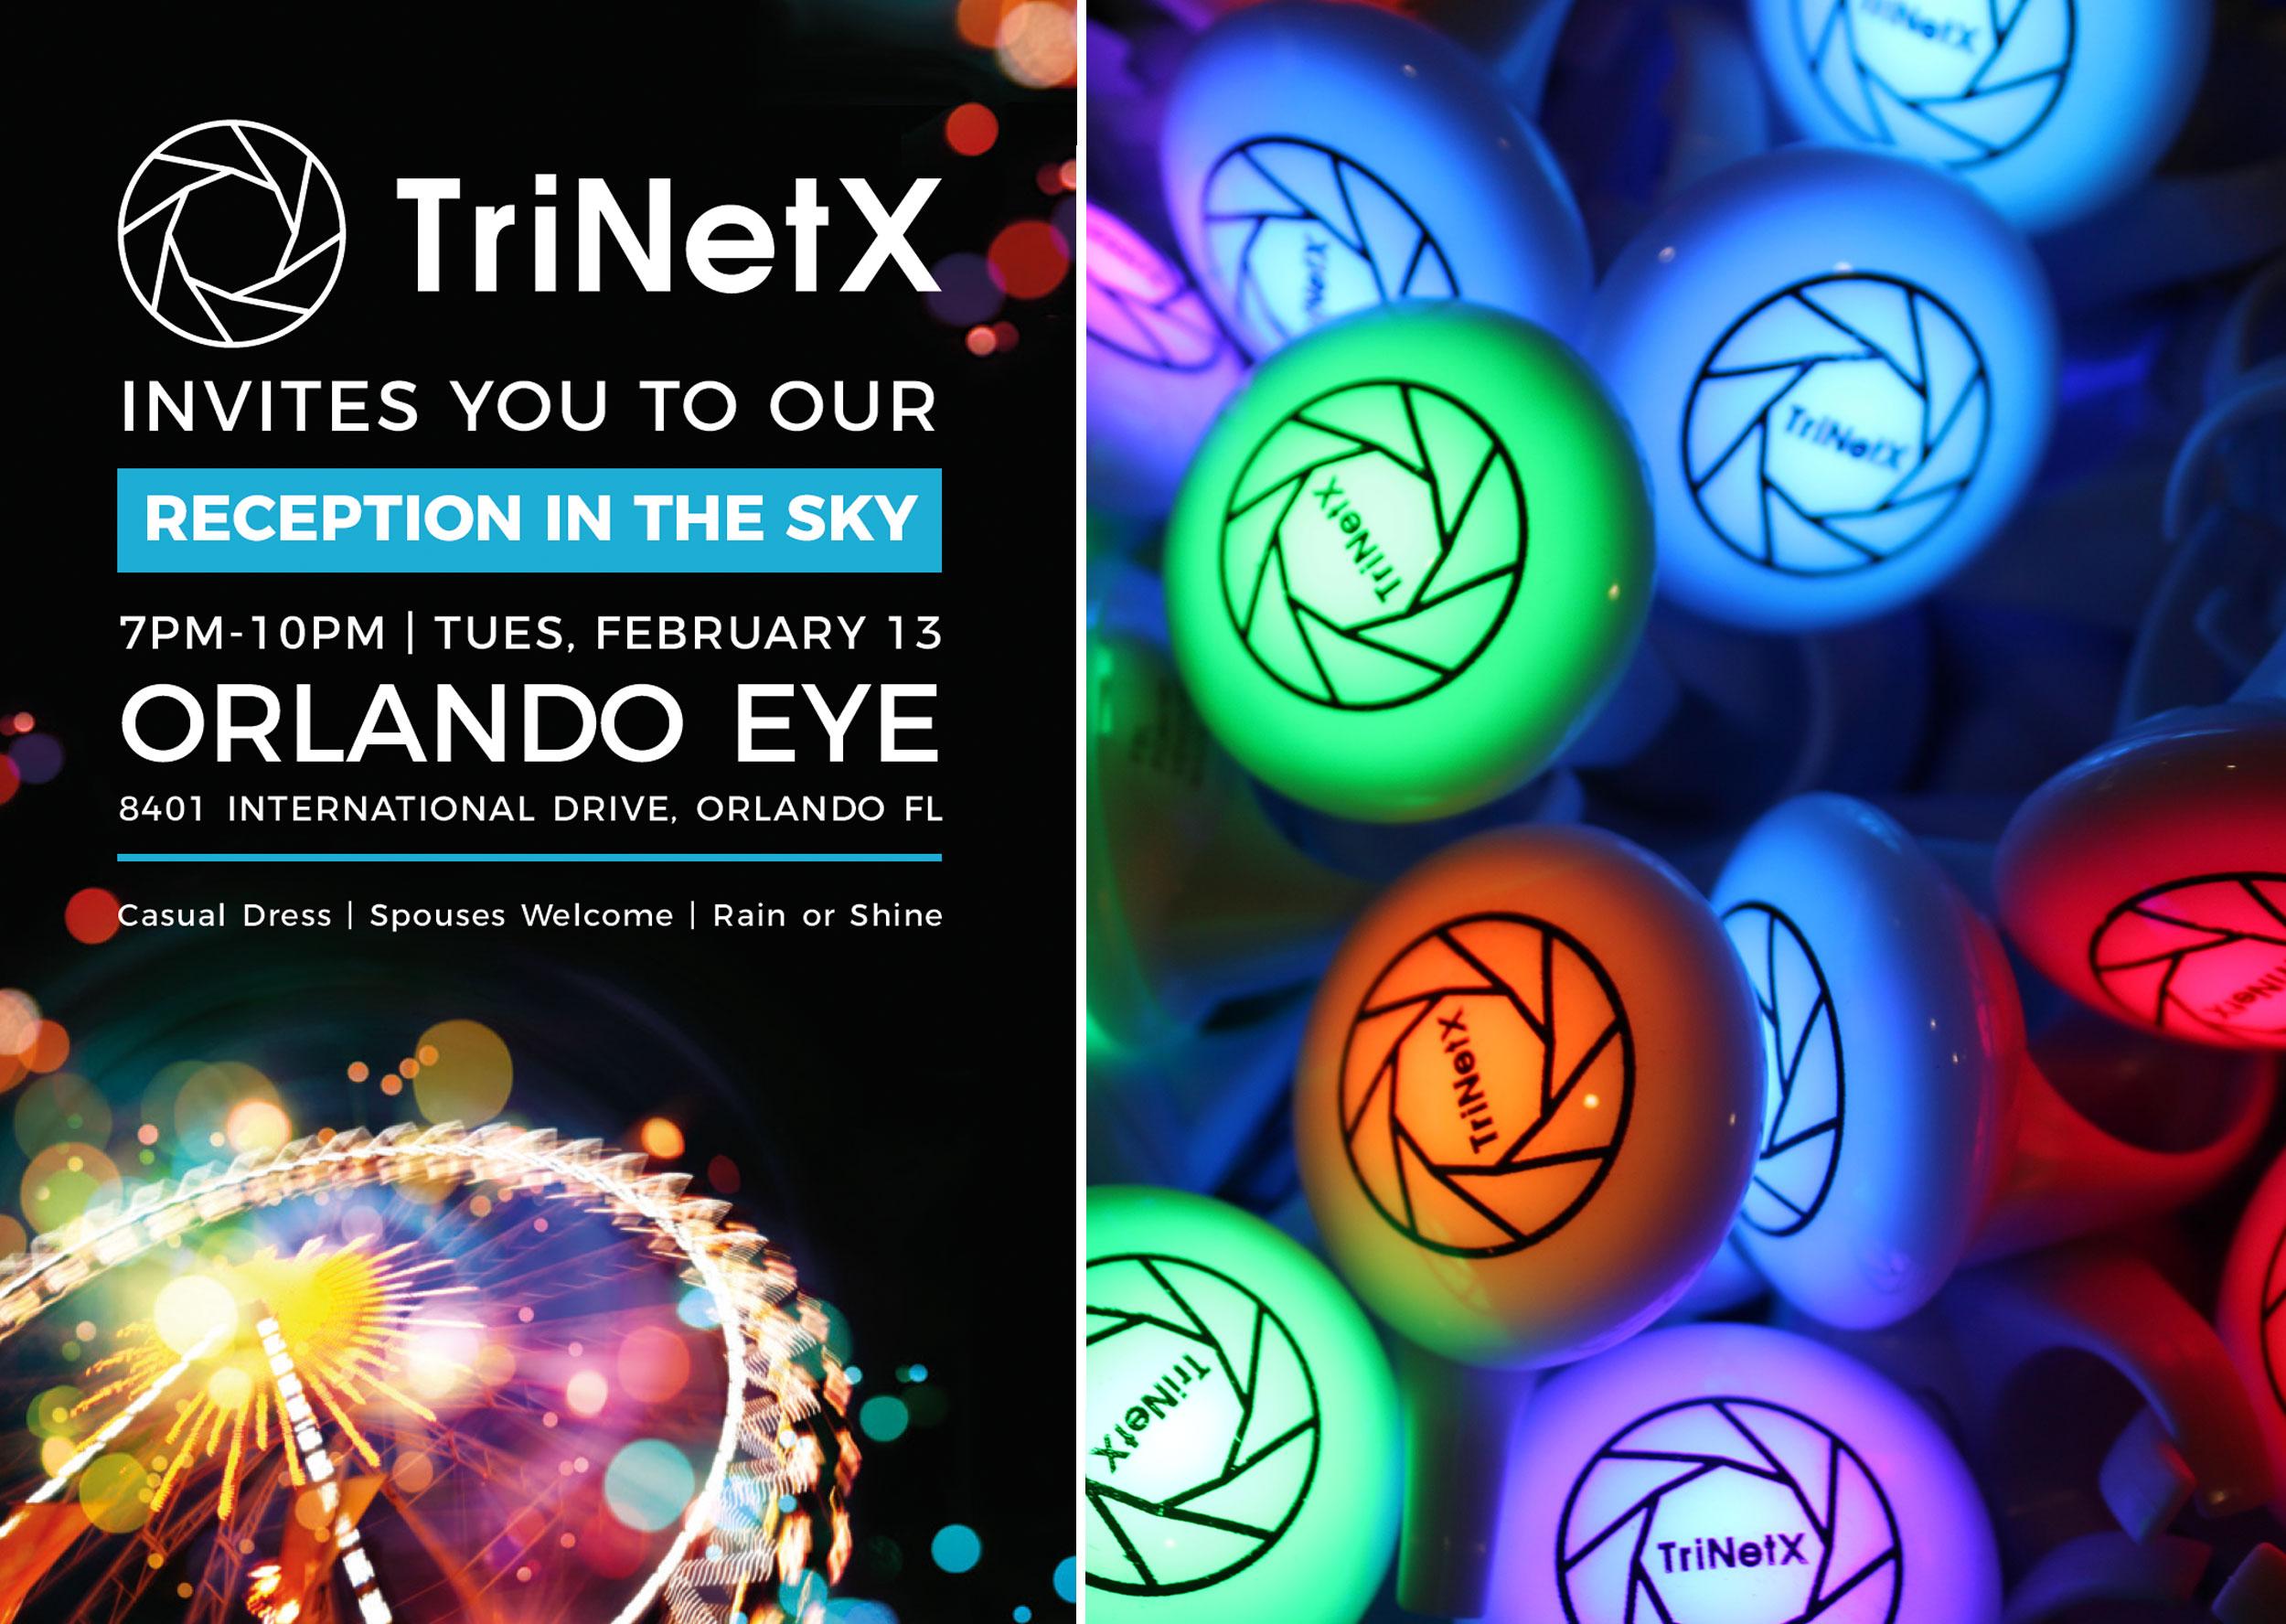 Orlando Eye Event